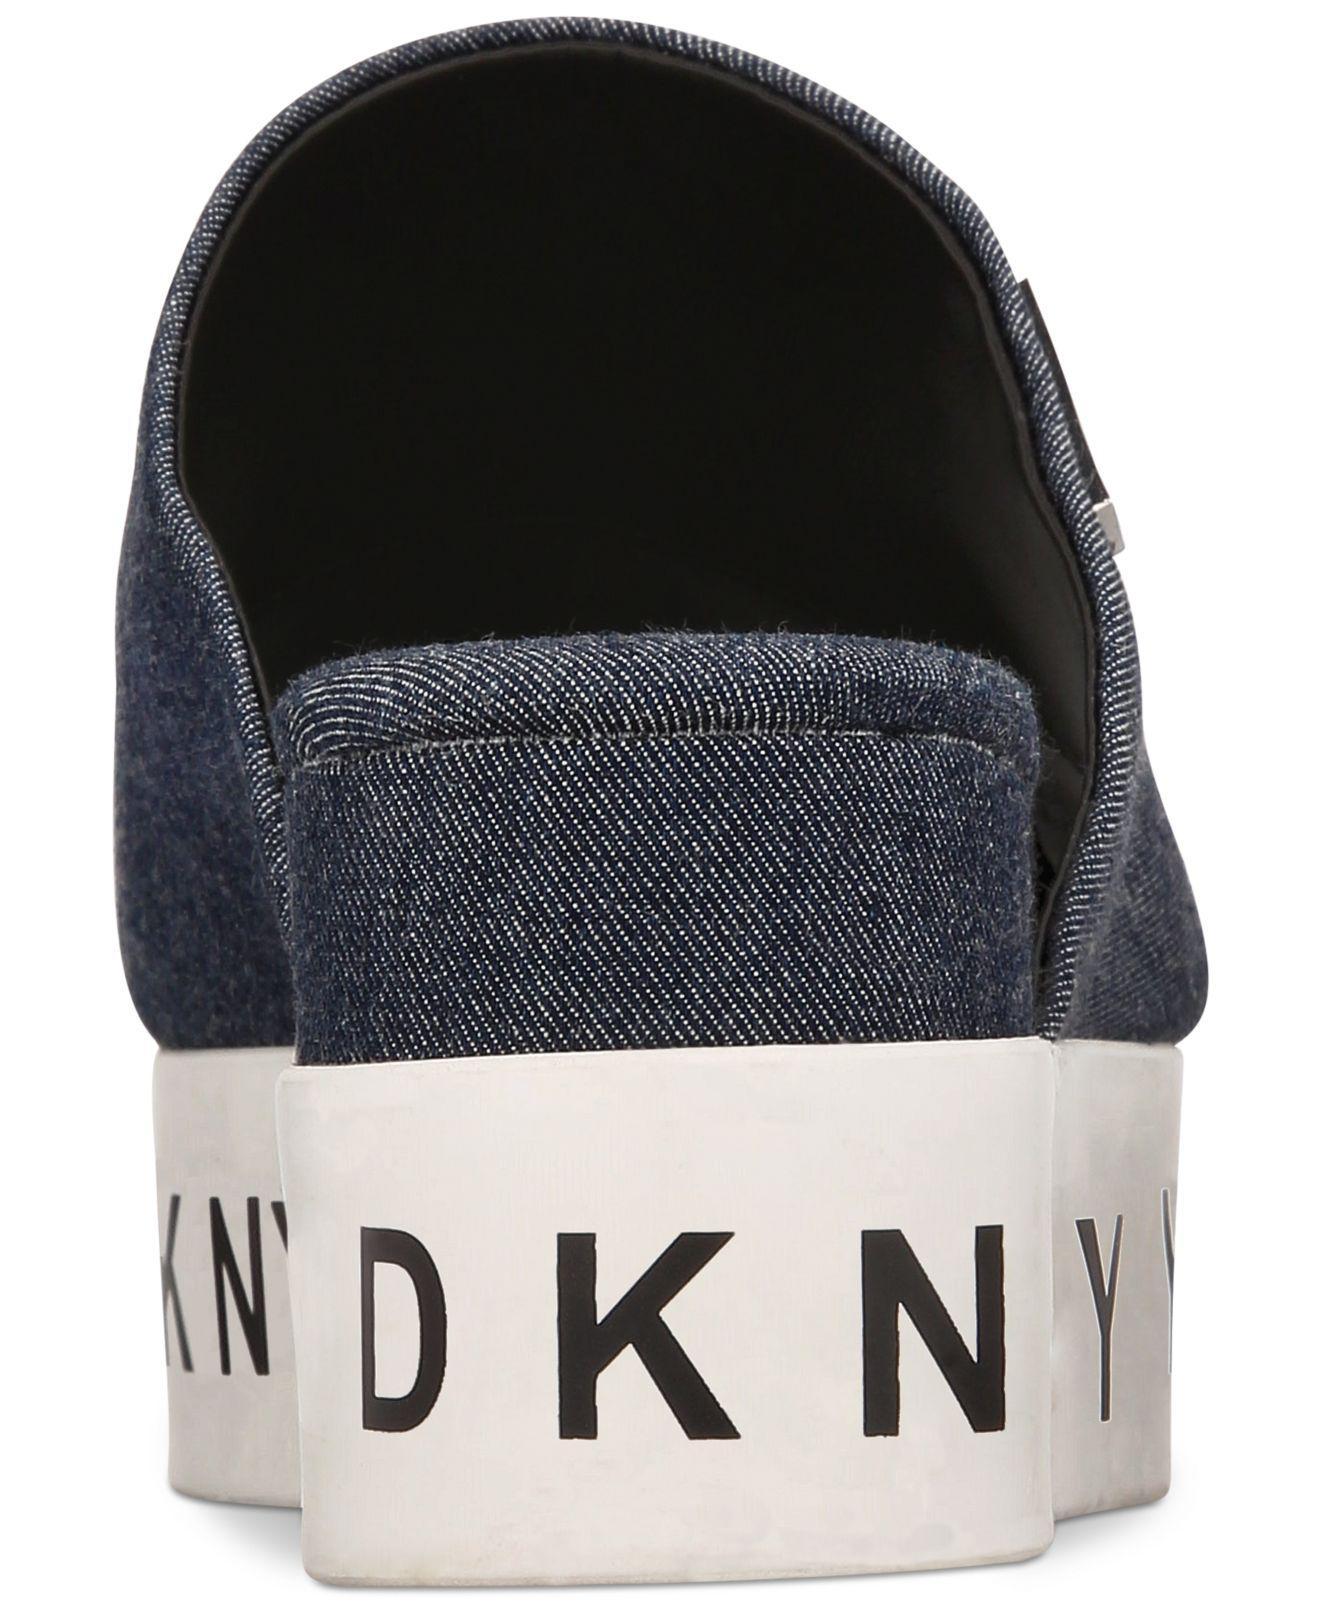 9aacebb54f3 Lyst - DKNY Carli Flatform Sandals